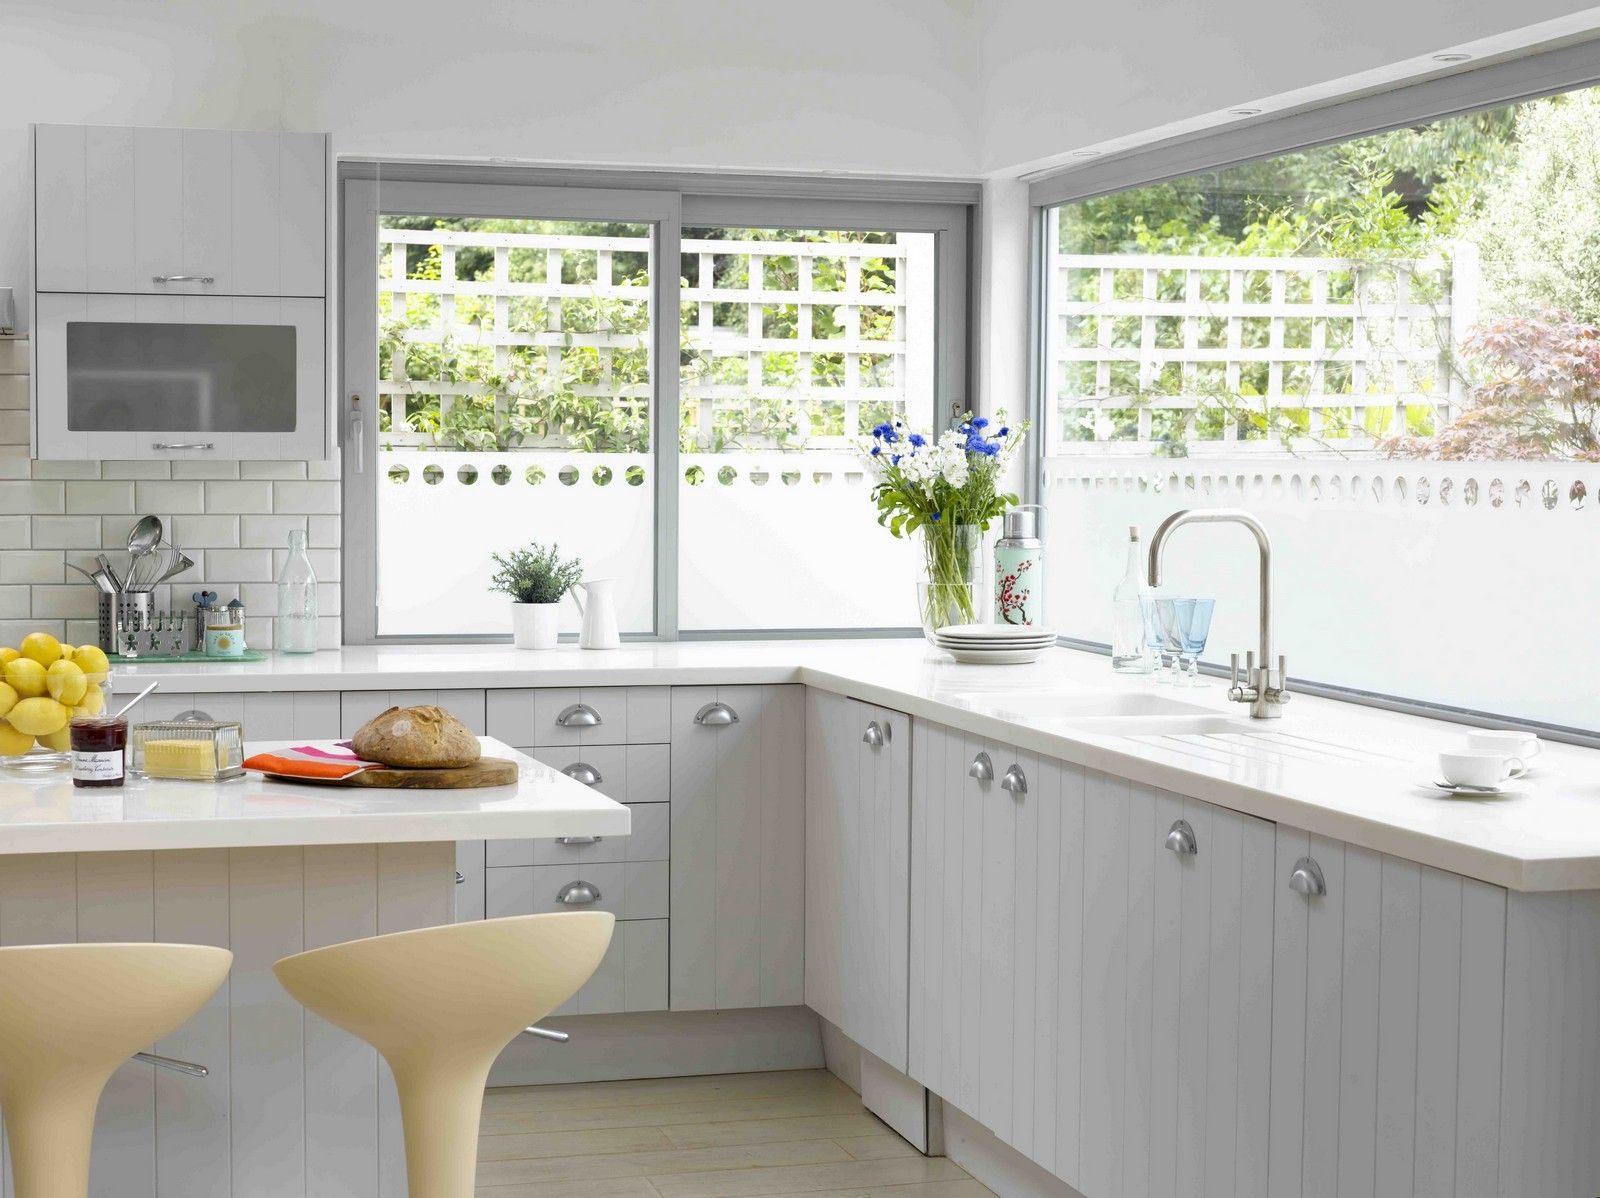 kitchen window ideas Kitchen Window Design Ideas Using Chrome Faucet with